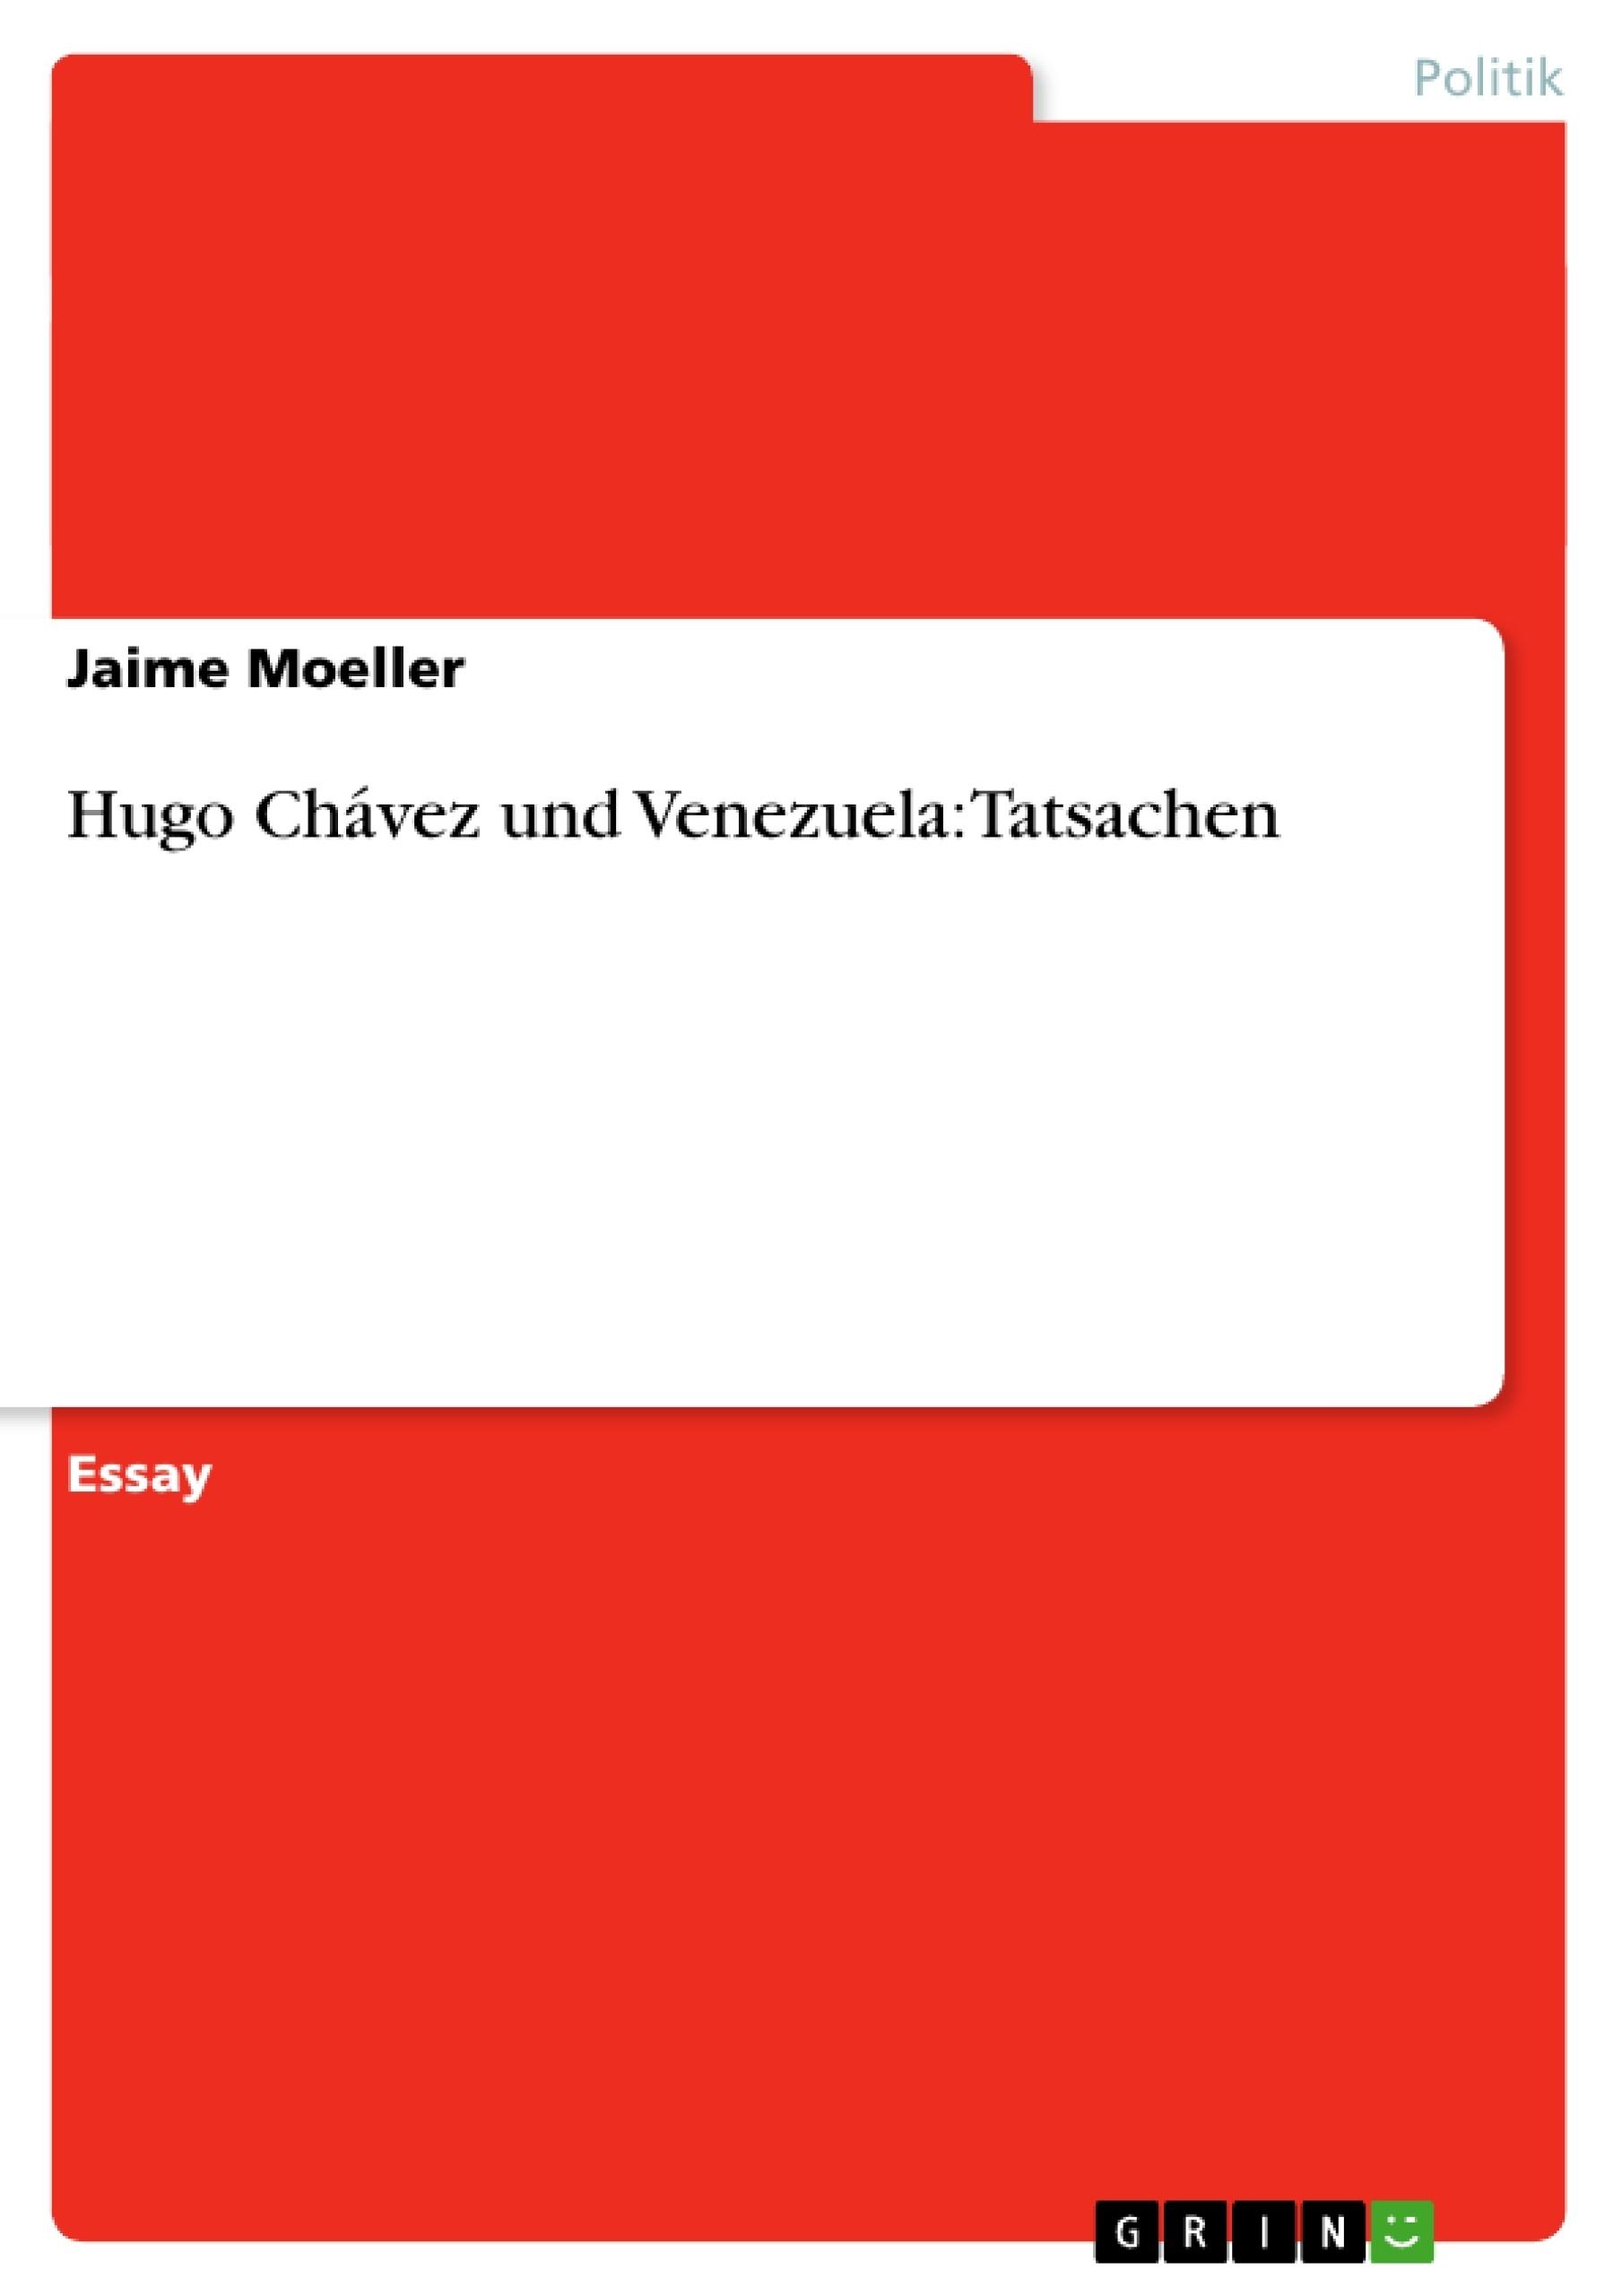 Titel: Hugo Chávez und Venezuela: Tatsachen